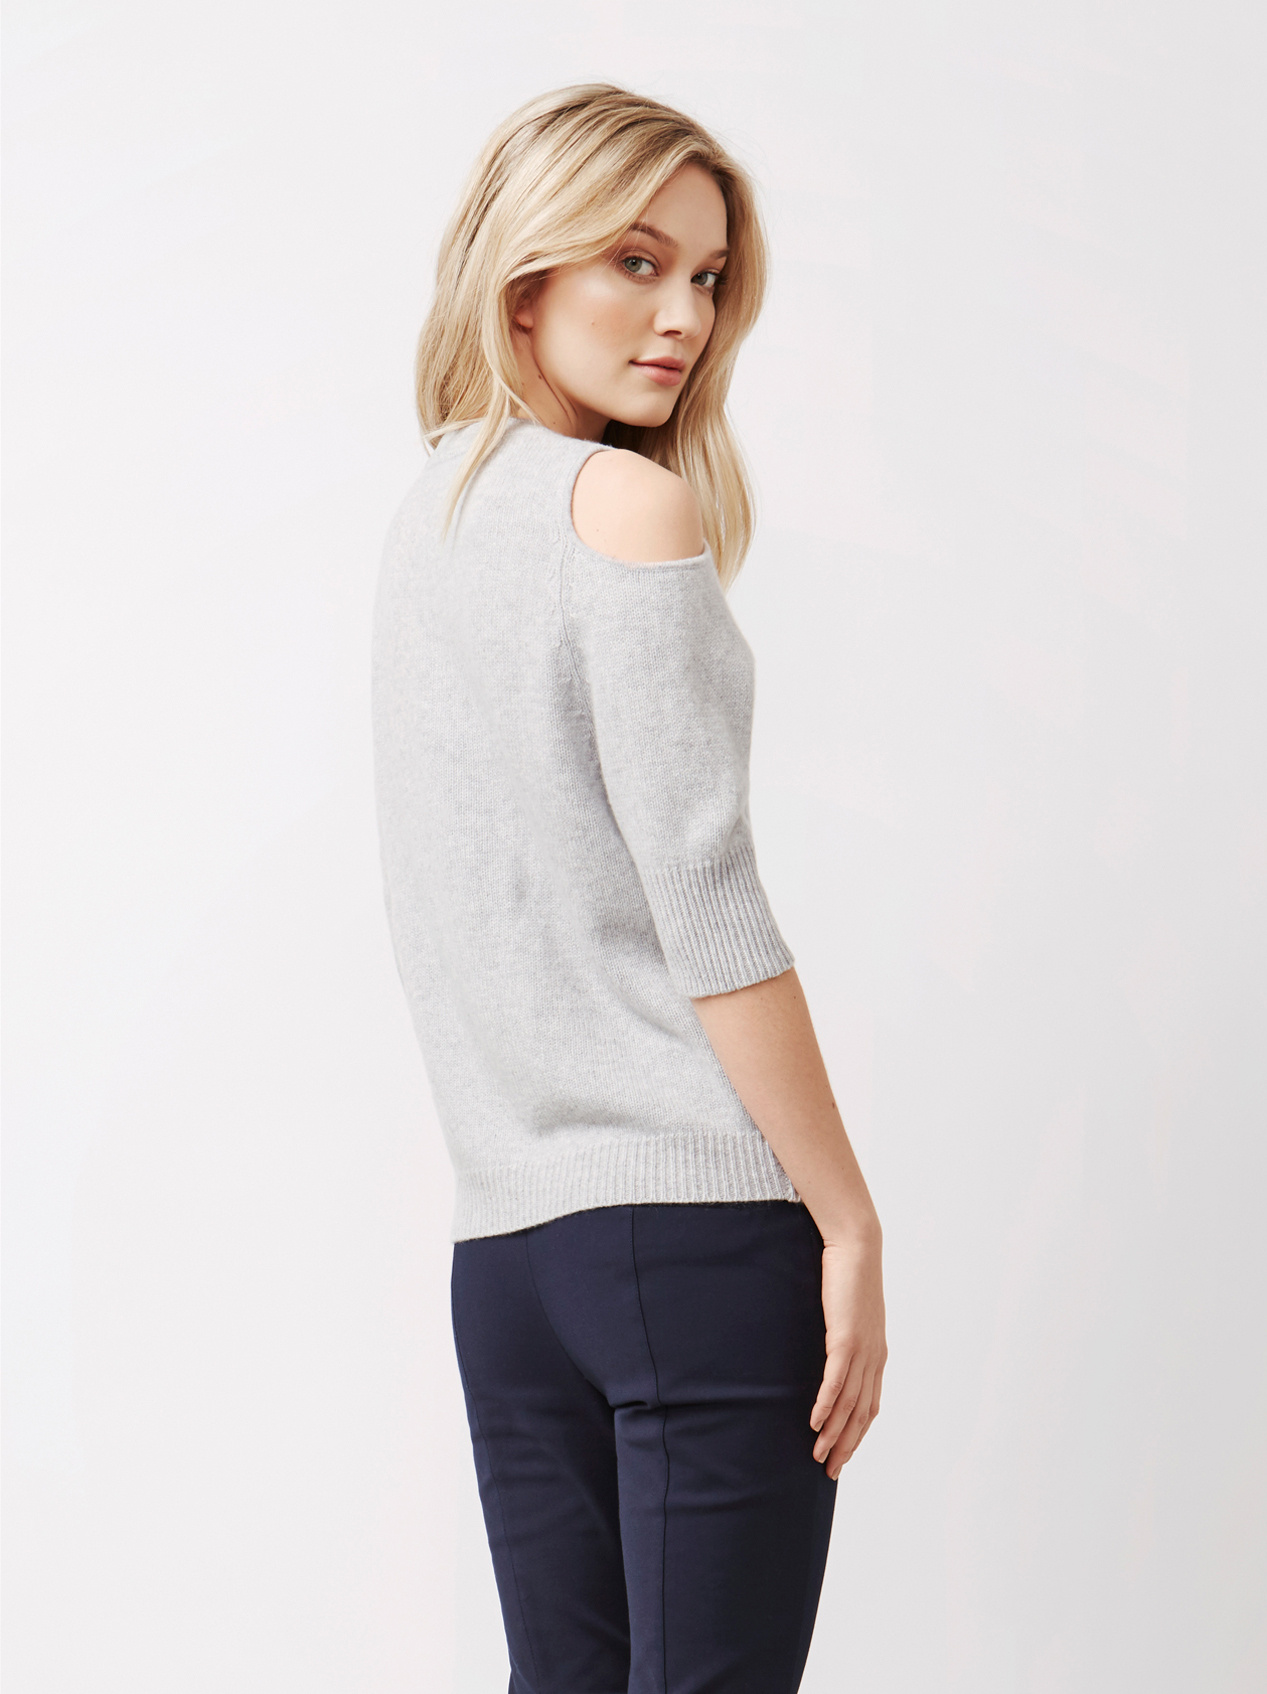 Soft Goat Women's Cold Shoulder Sweater Light Grey